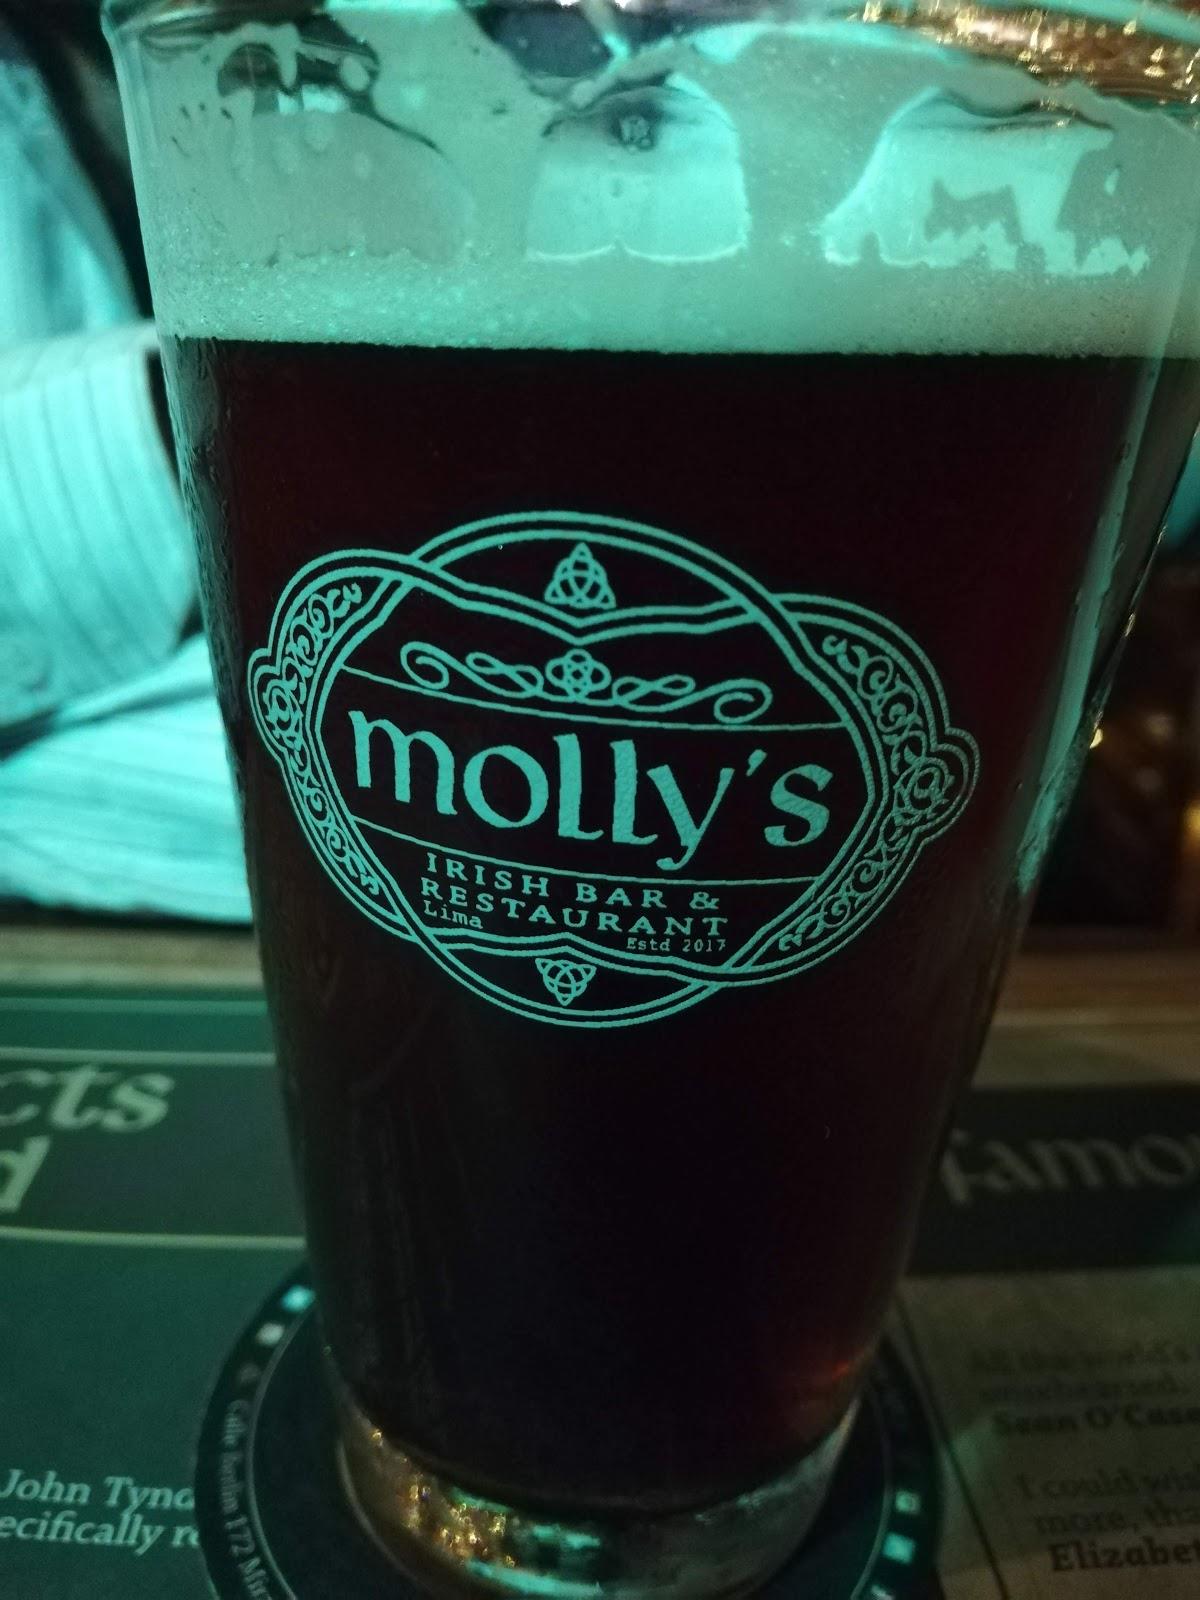 Molly's Irish Bar & Restaurant